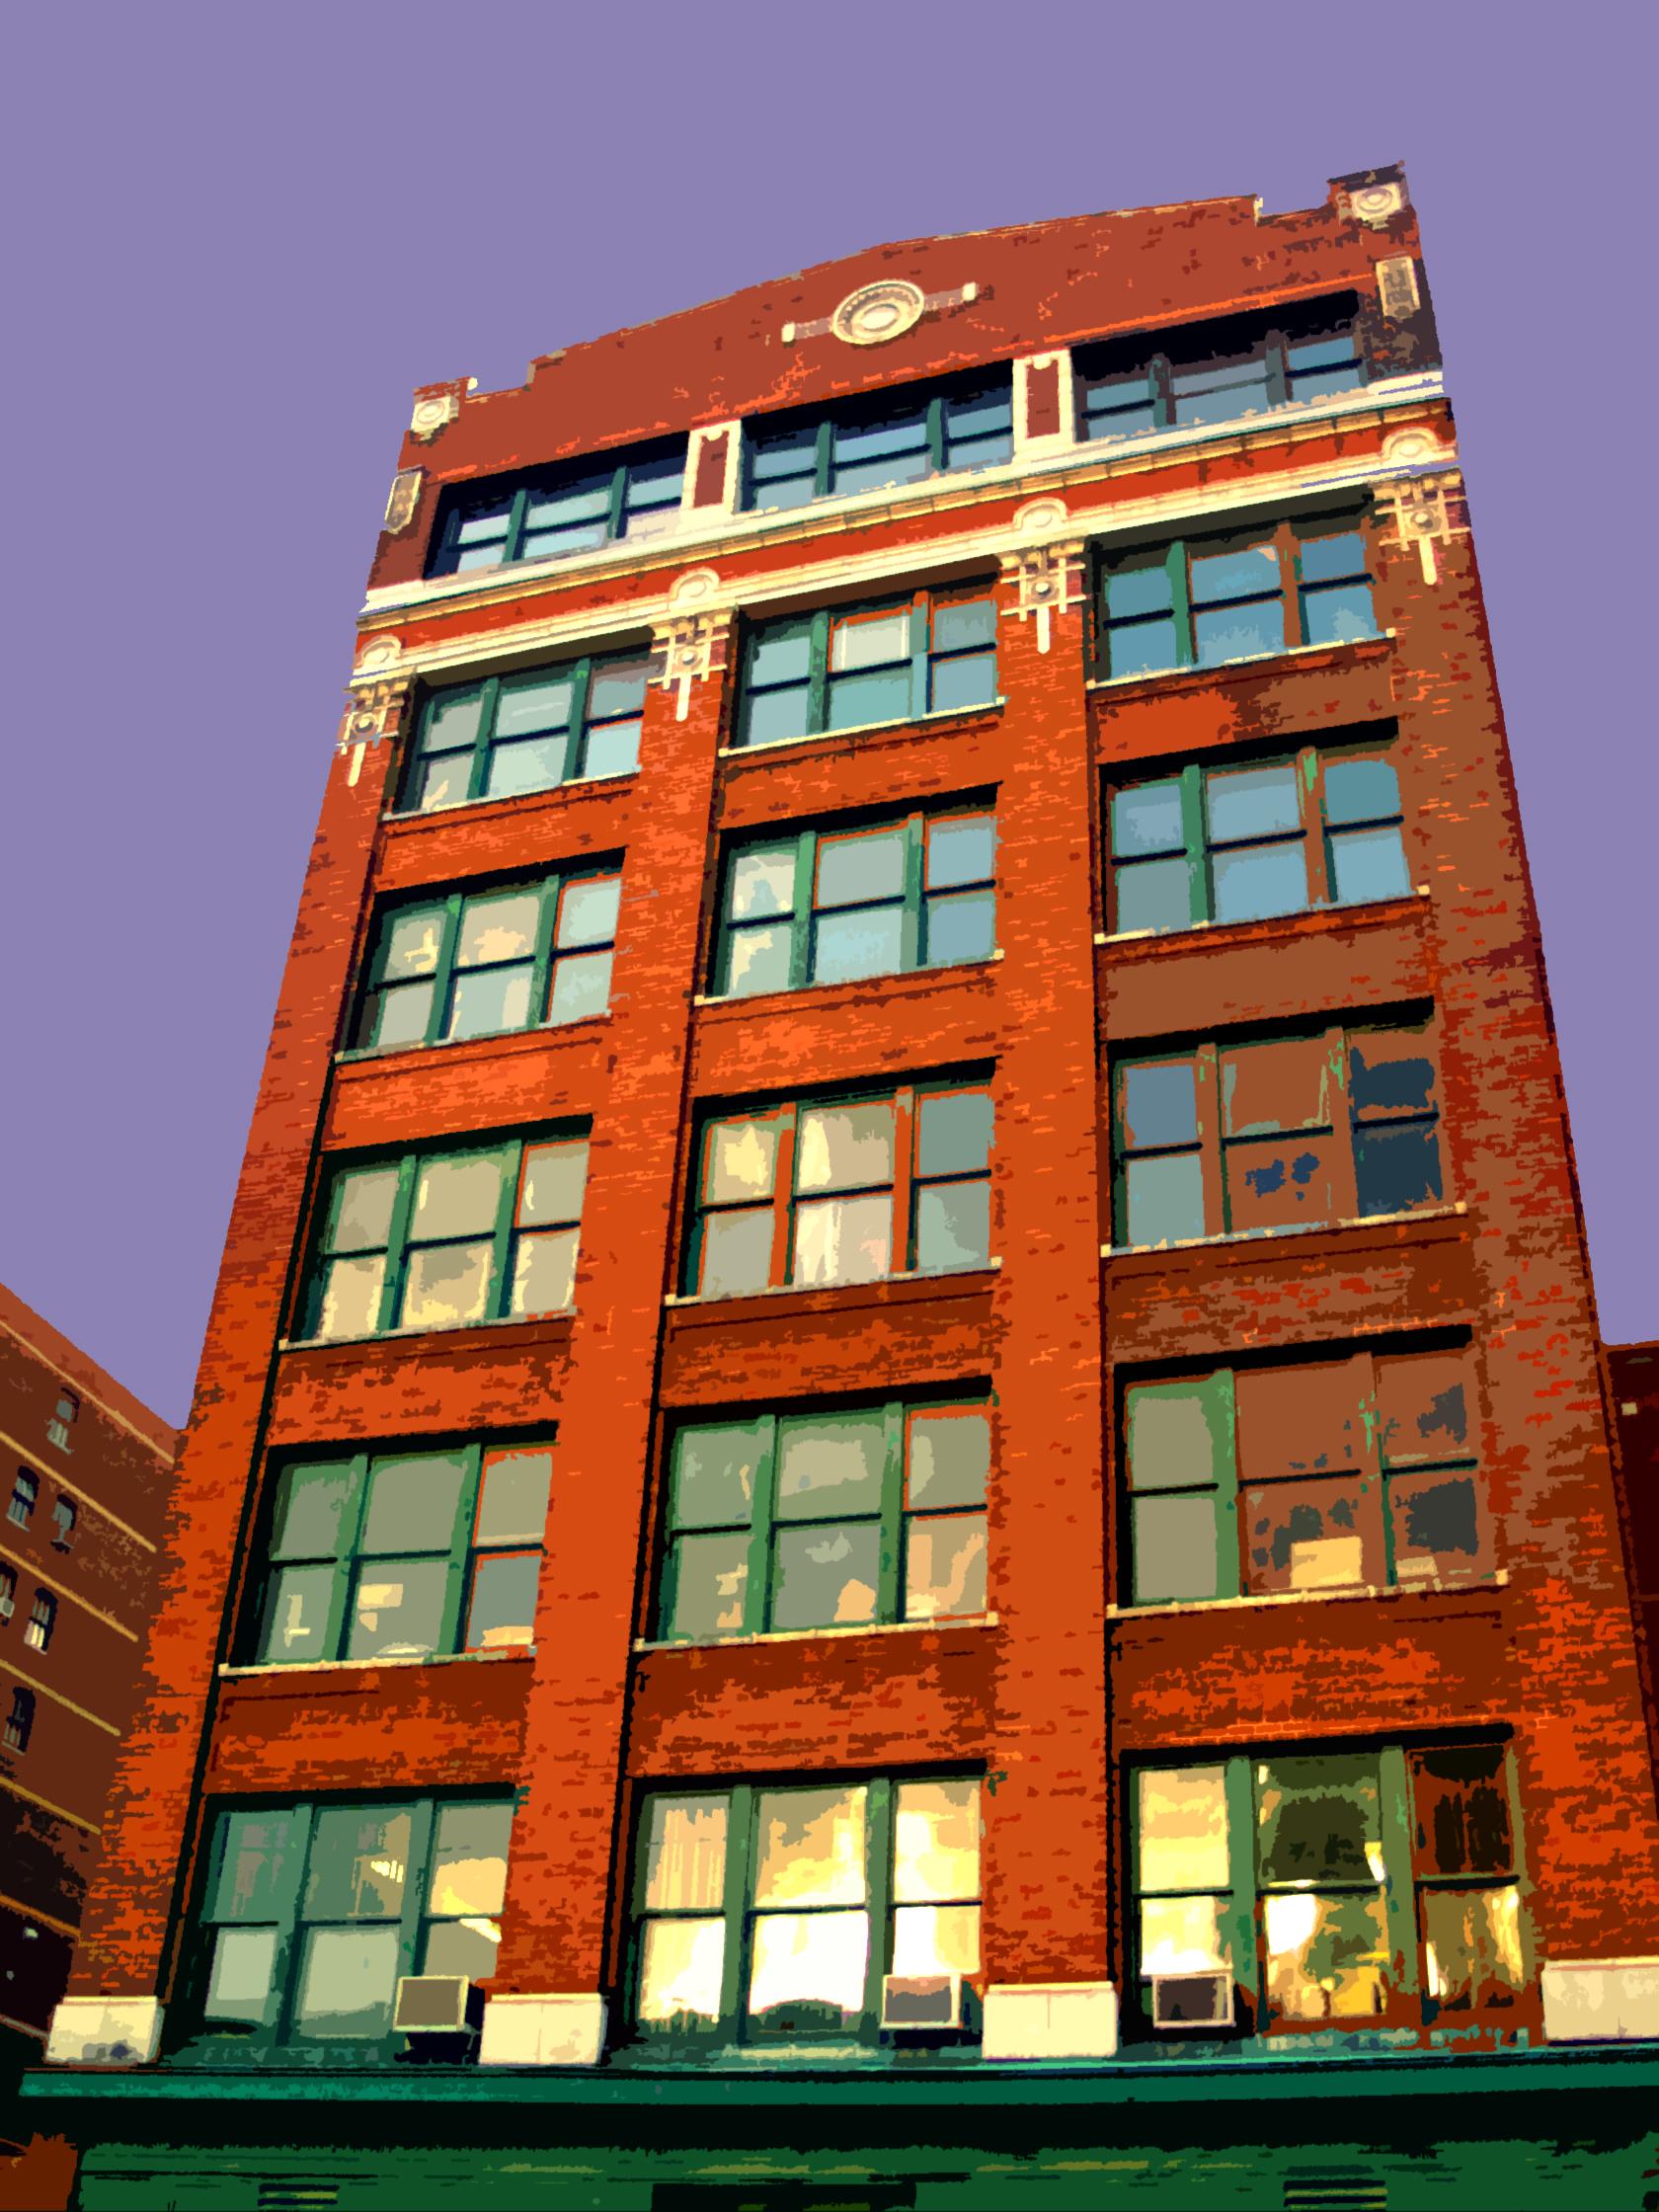 South Loop Warehouse, digitally enhanced photograph, 2005